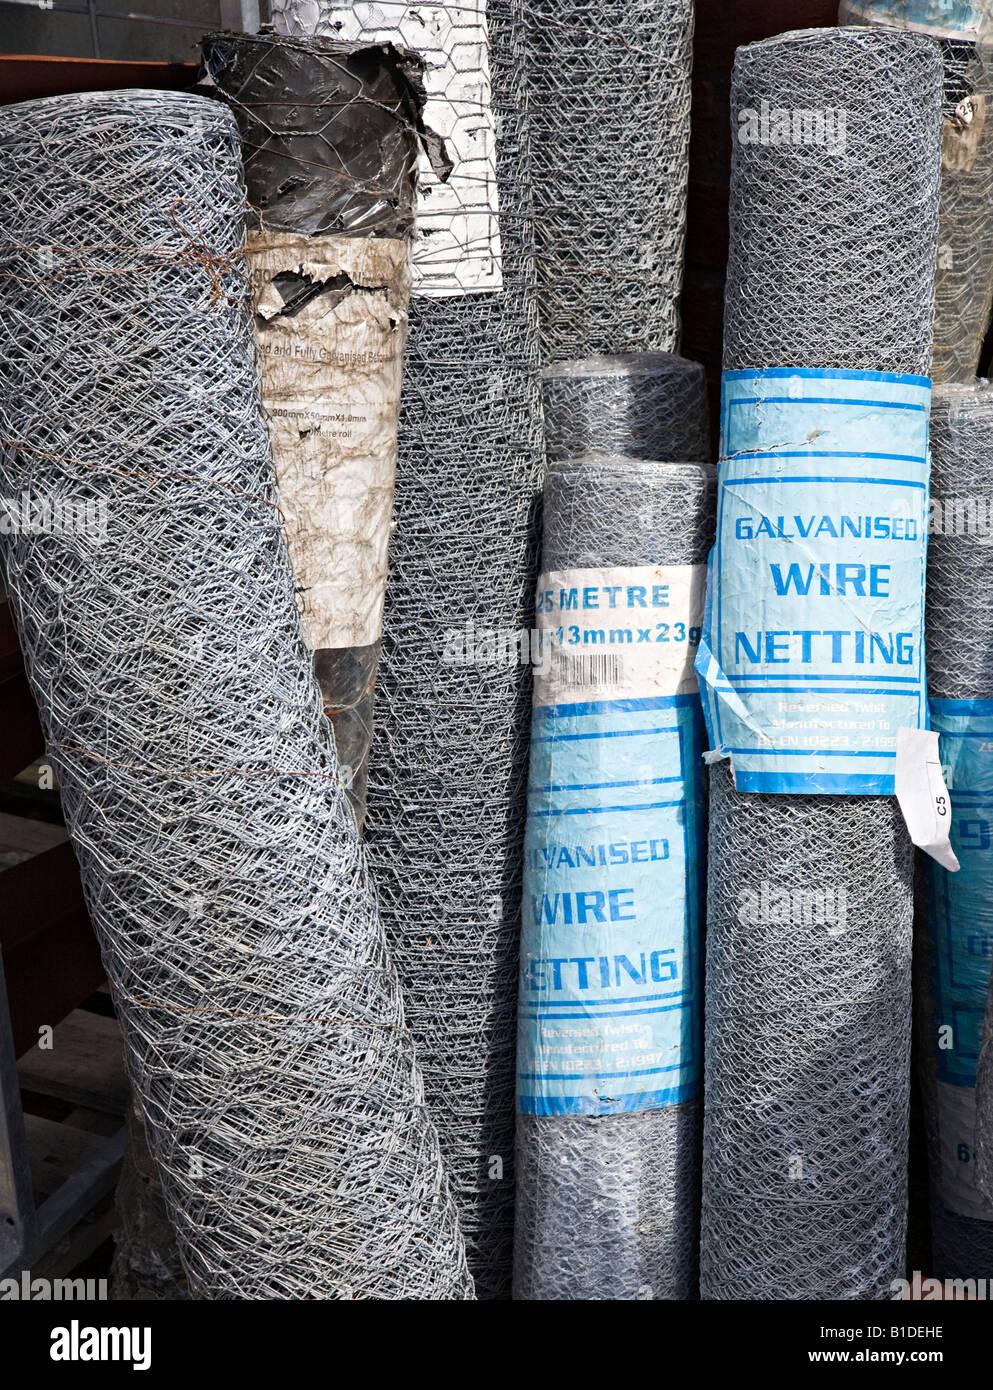 Wire Netting Stockfotos & Wire Netting Bilder - Alamy